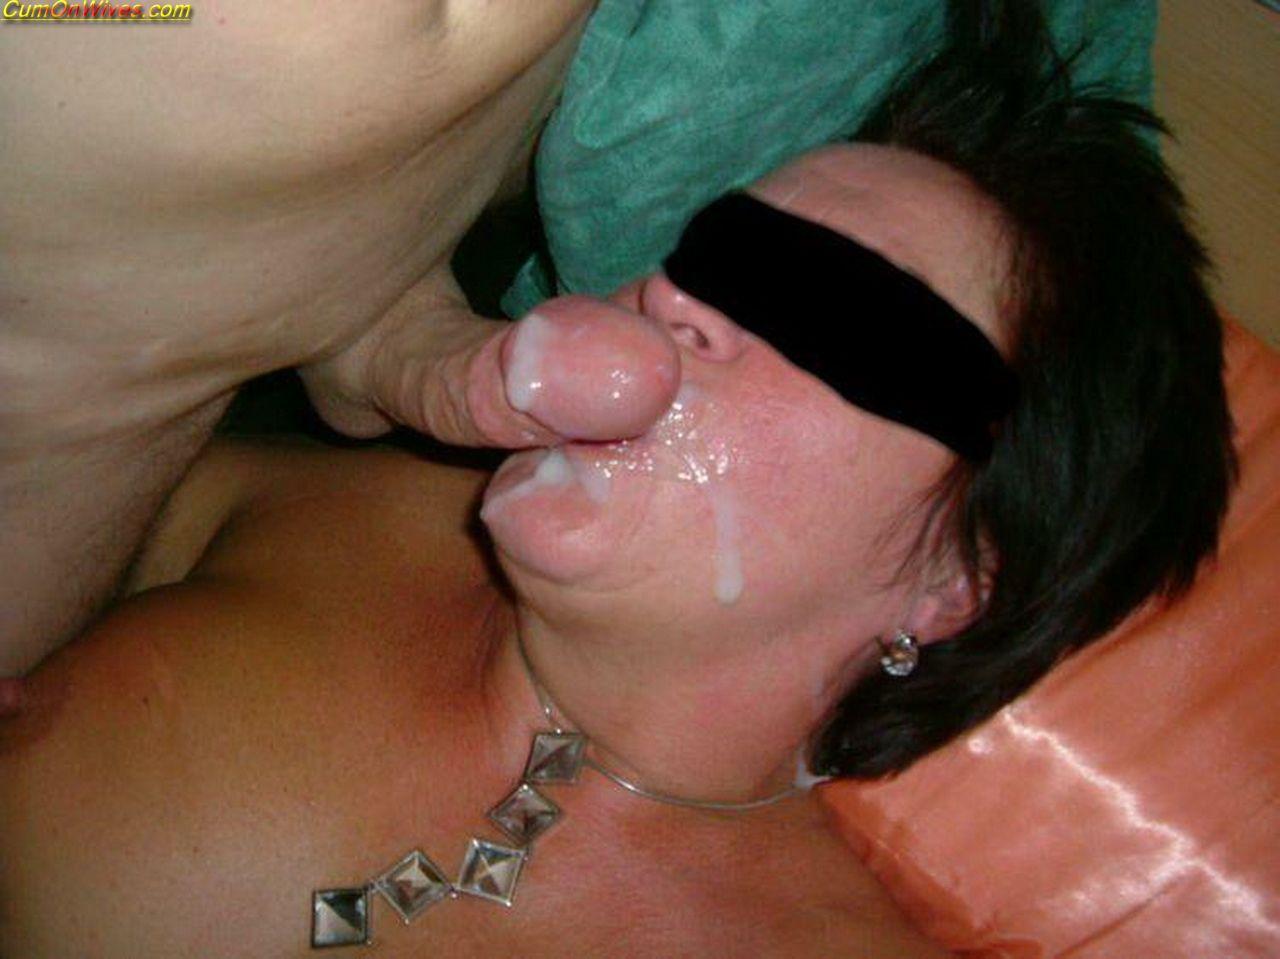 luder i kbh svendborg thai massage